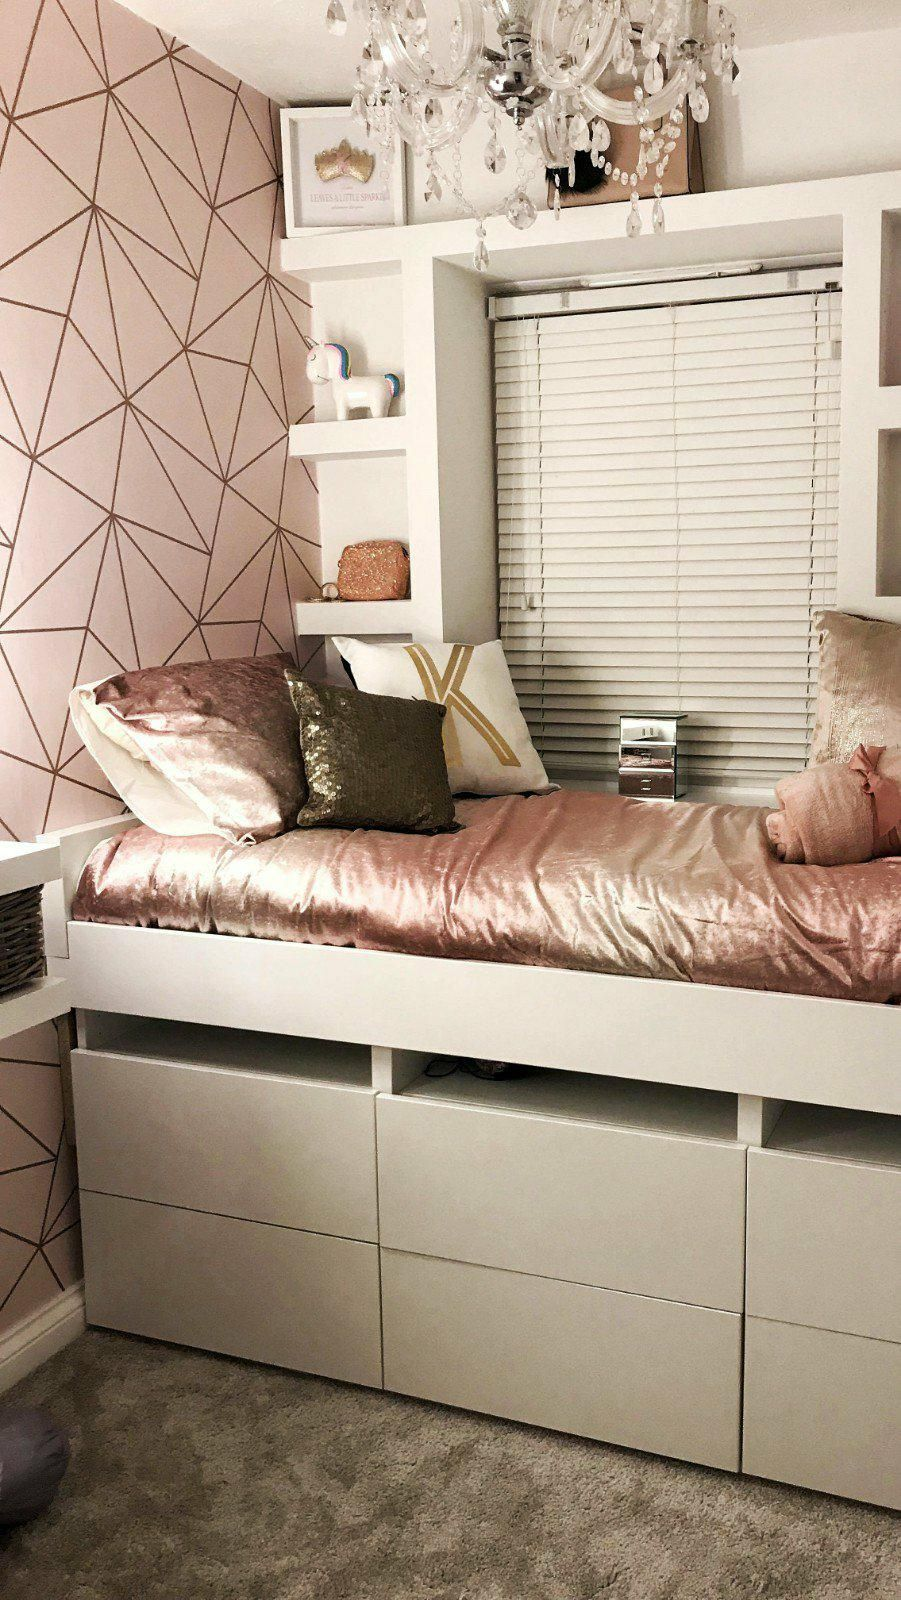 I Love Wallpaper Zara Shimmer Metallic Wallpaper Soft Pink Rose Gold Ilw980111 The Perfect Way Girls Bedroom Wallpaper Rose Gold Bedroom Girl Bedroom Walls